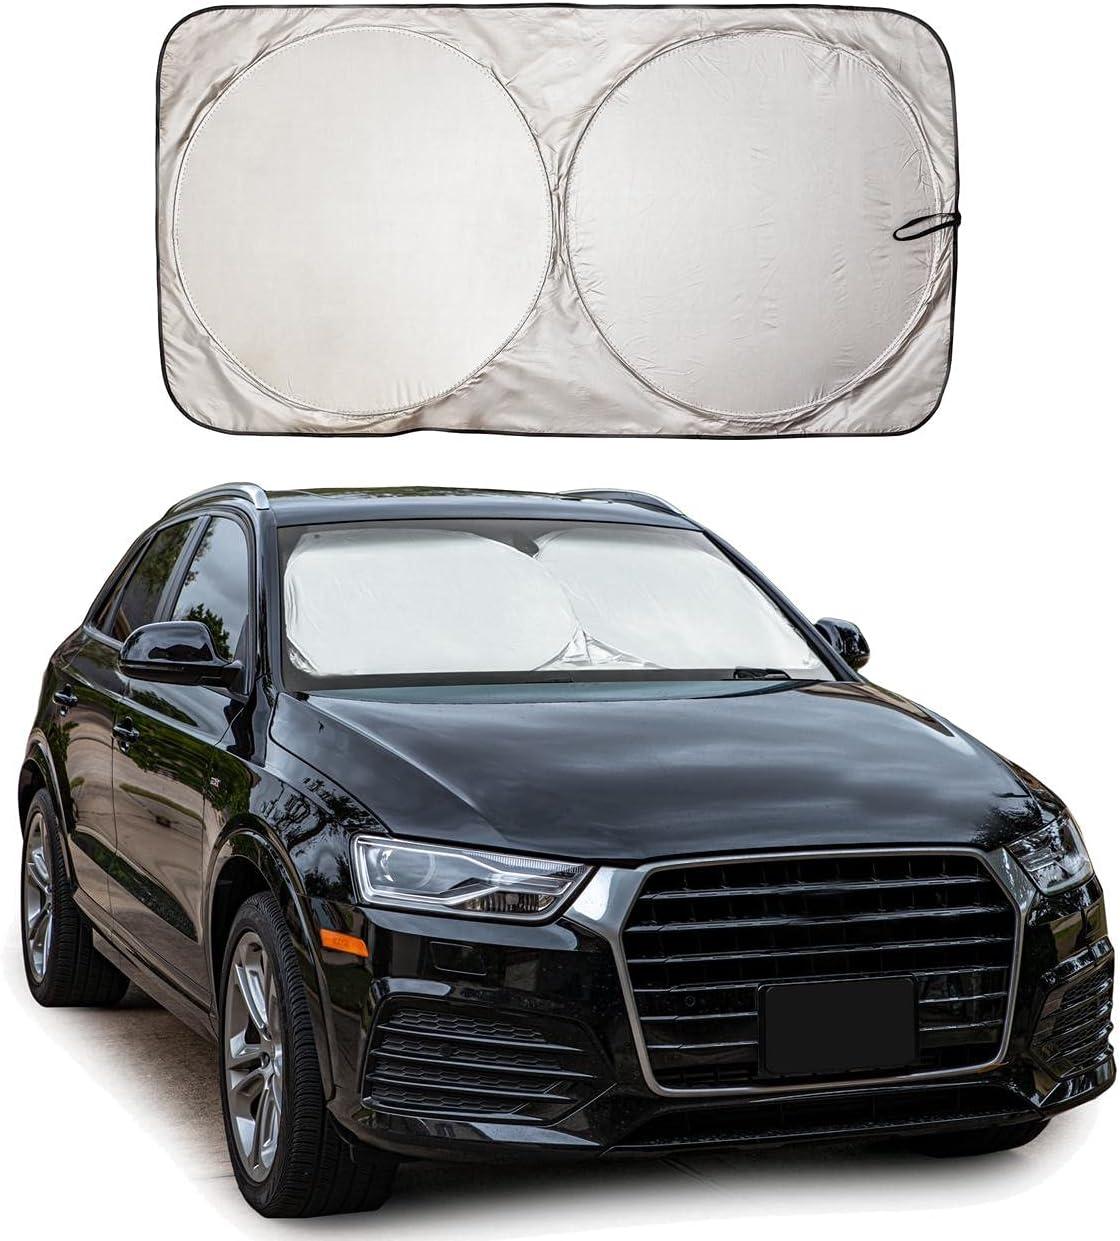 EcoNour汽车挡风玻璃遮阳板